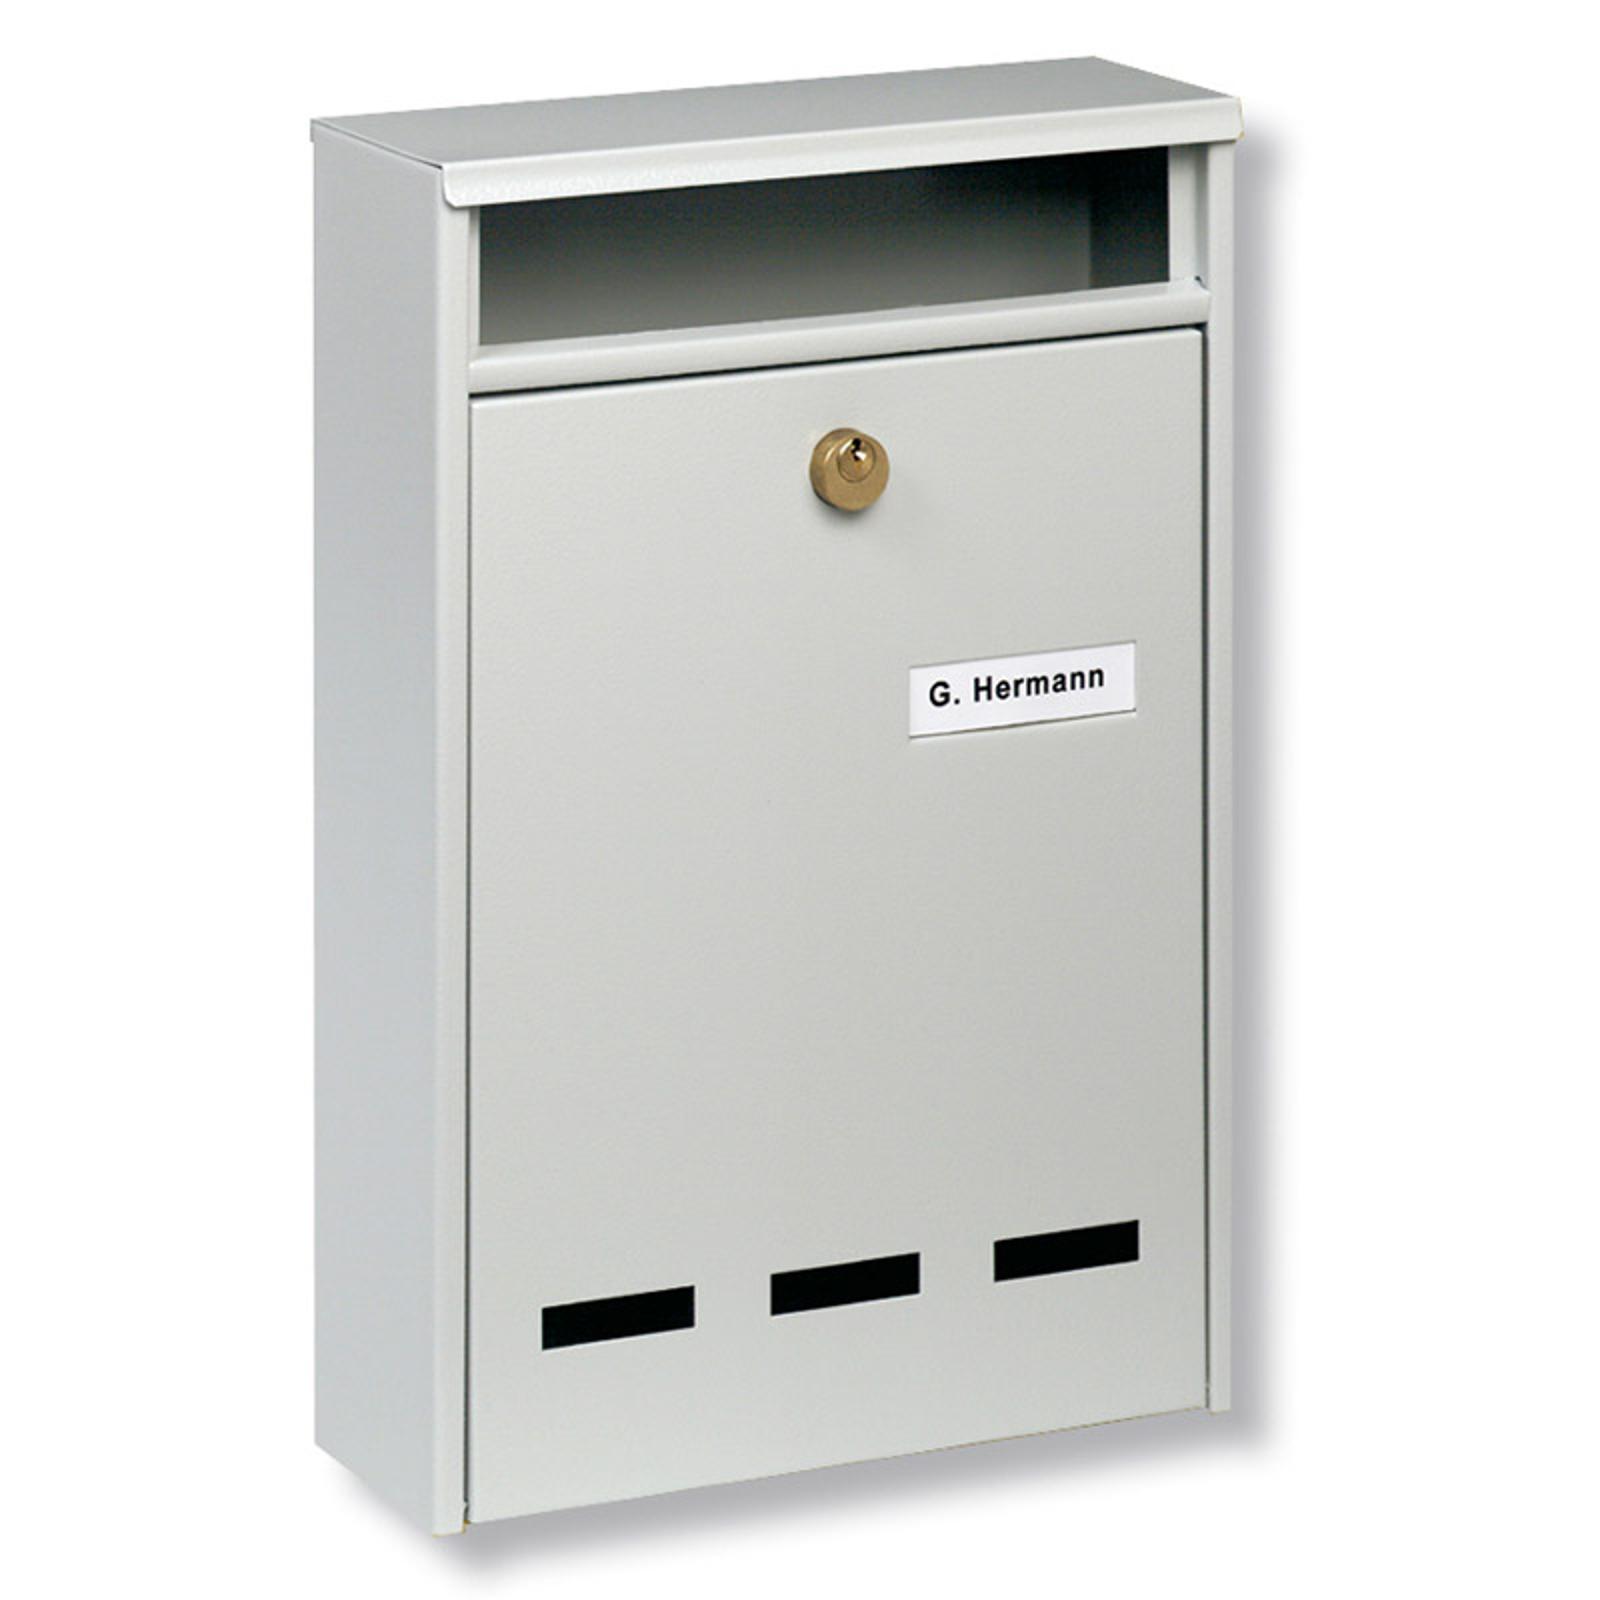 Standard anläggnings-brevlåda Wismar B5, vit